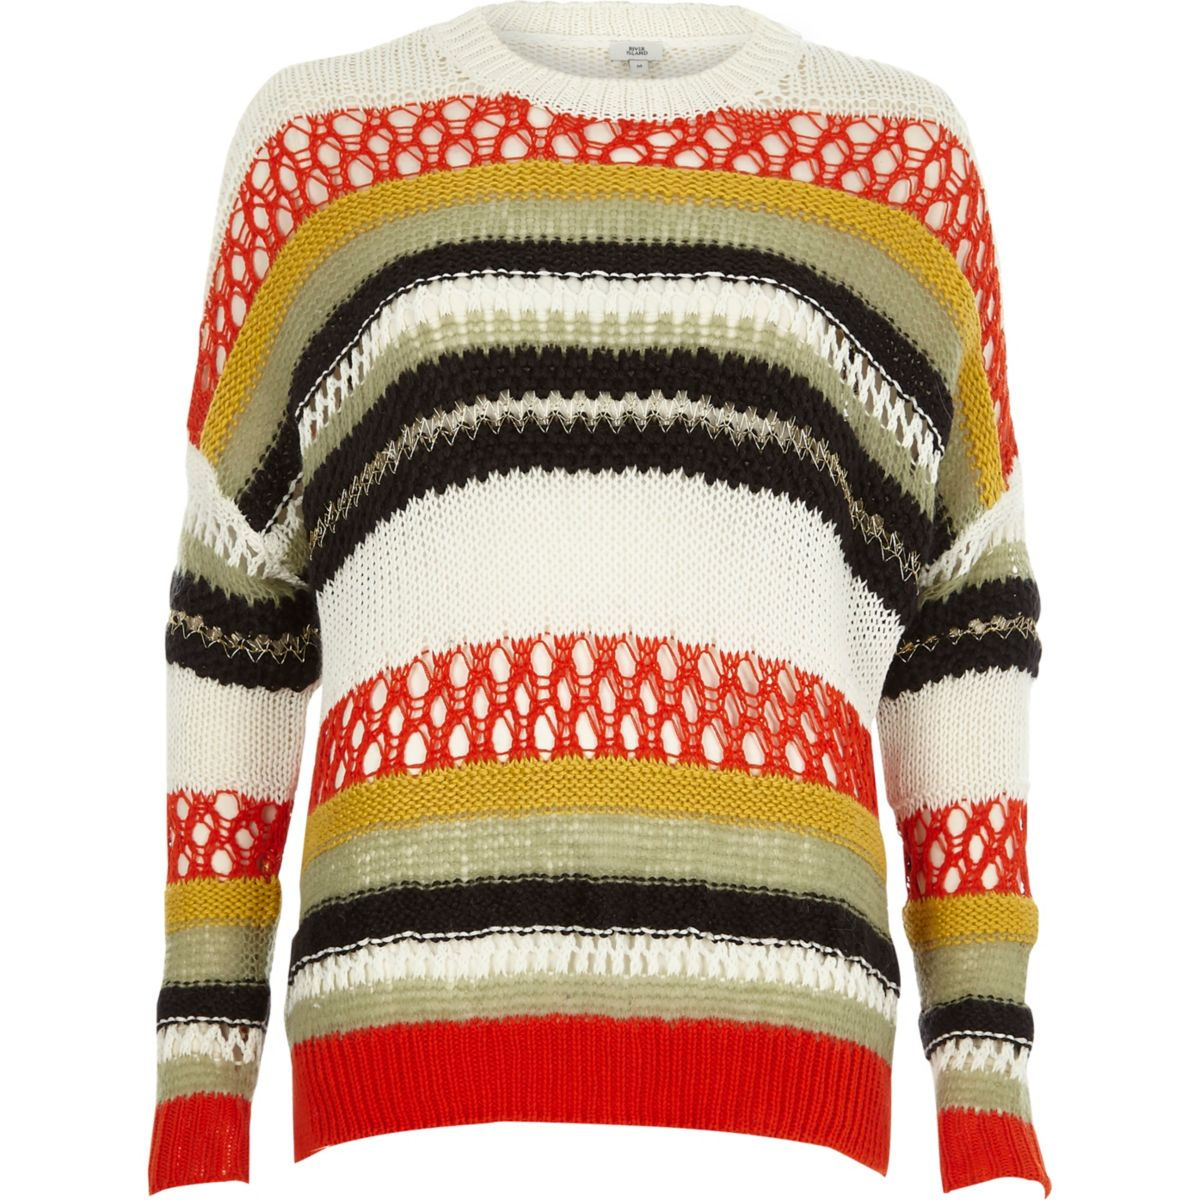 Orange multi color stripe mixed knit sweater